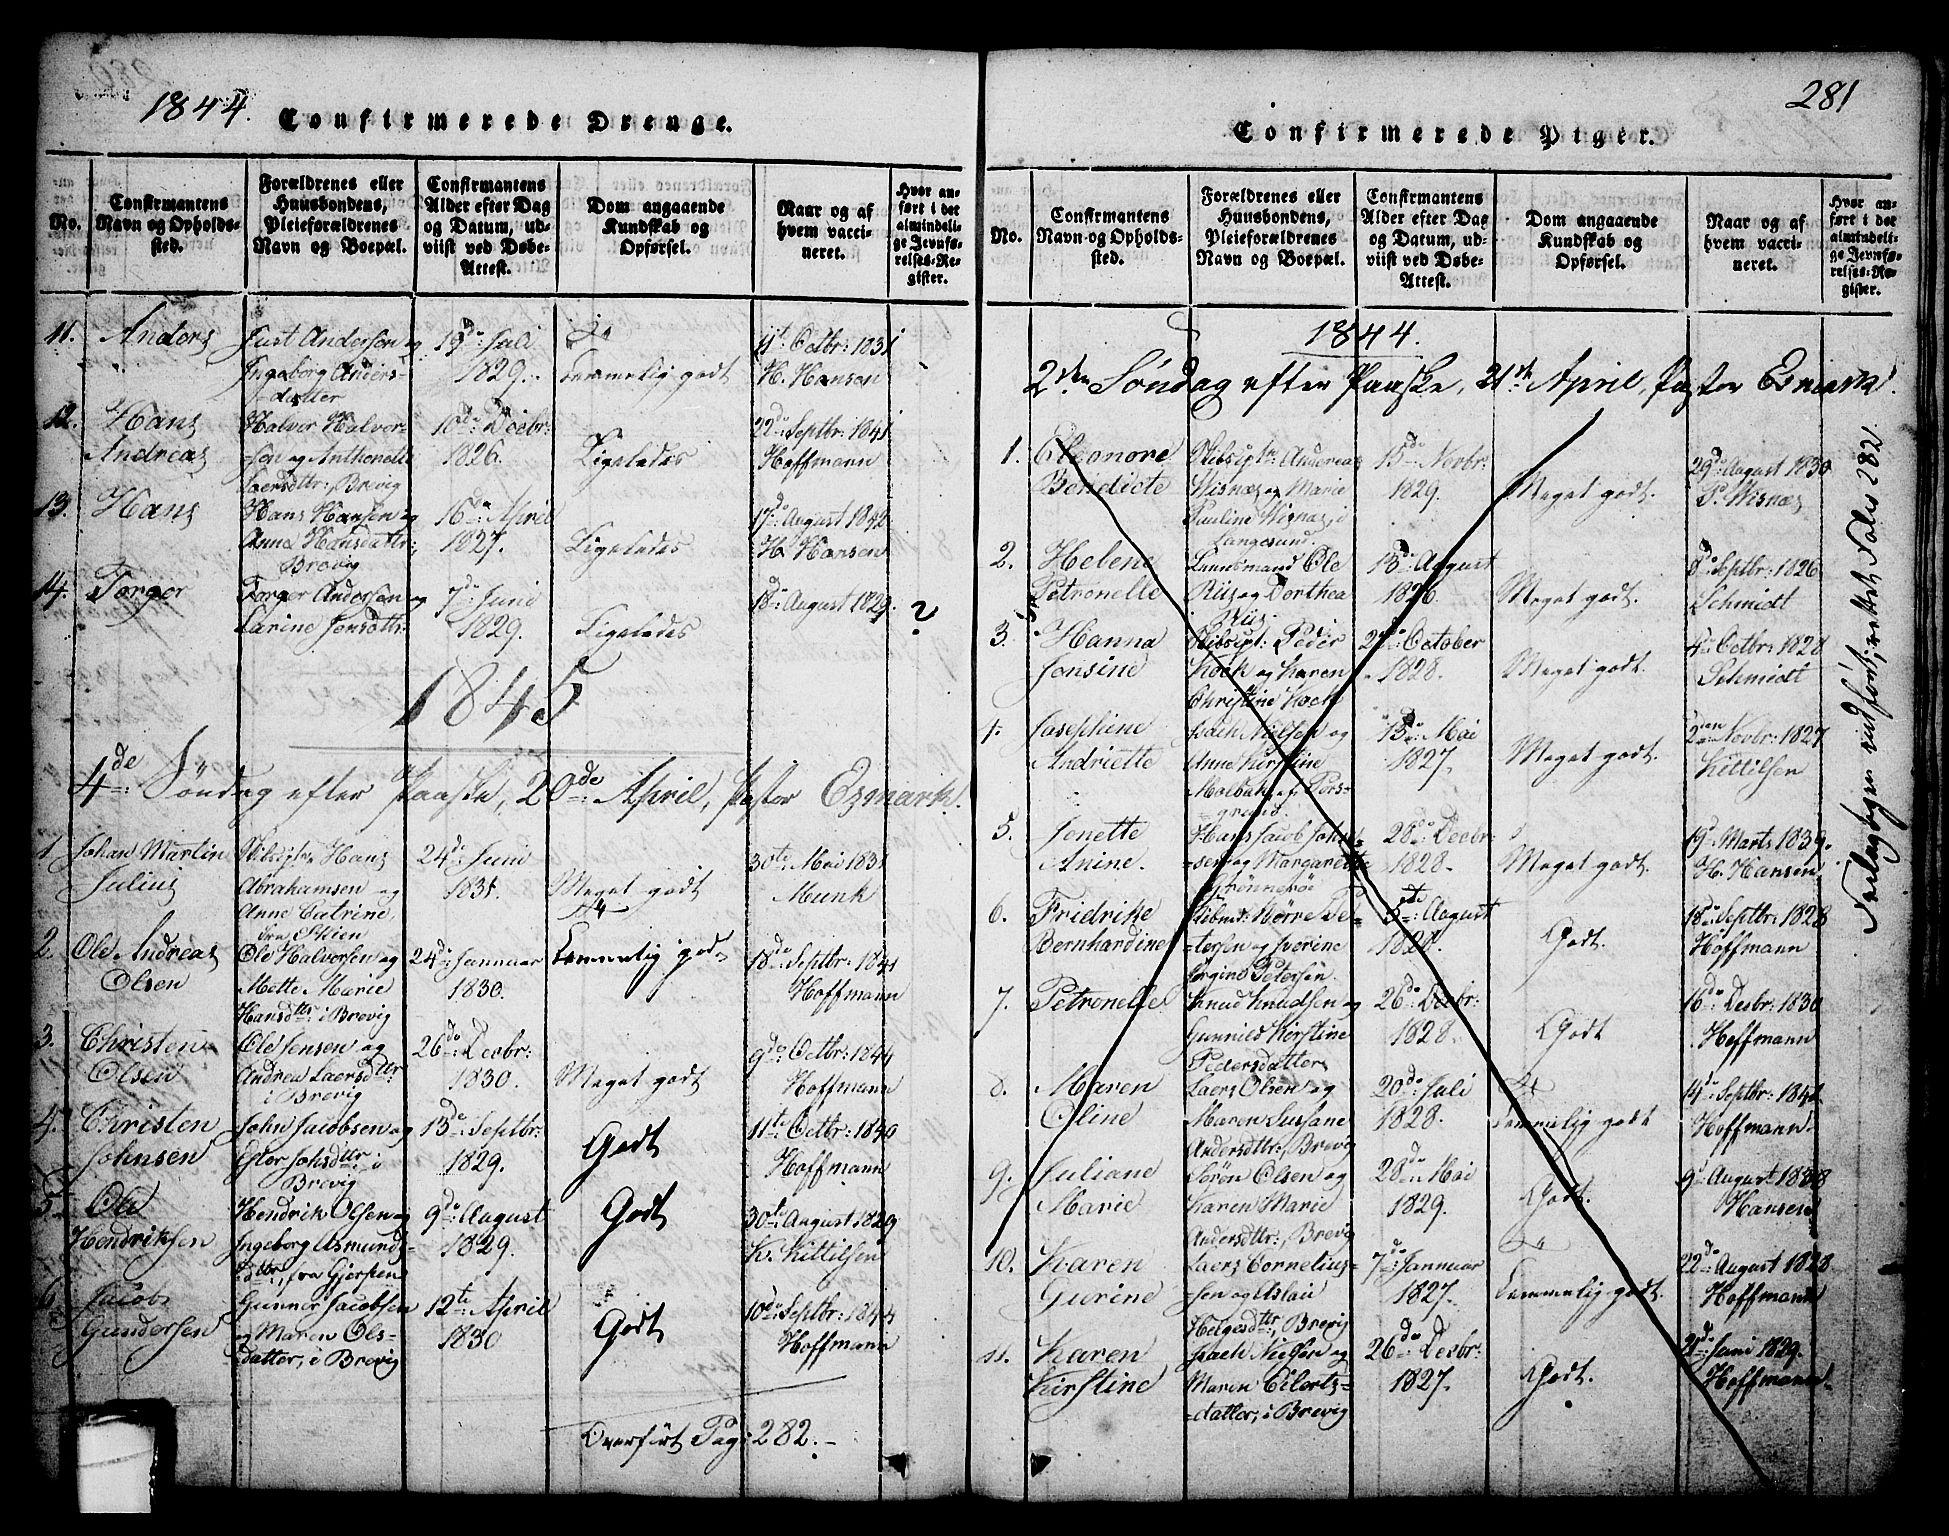 SAKO, Brevik kirkebøker, G/Ga/L0001: Klokkerbok nr. 1, 1814-1845, s. 281